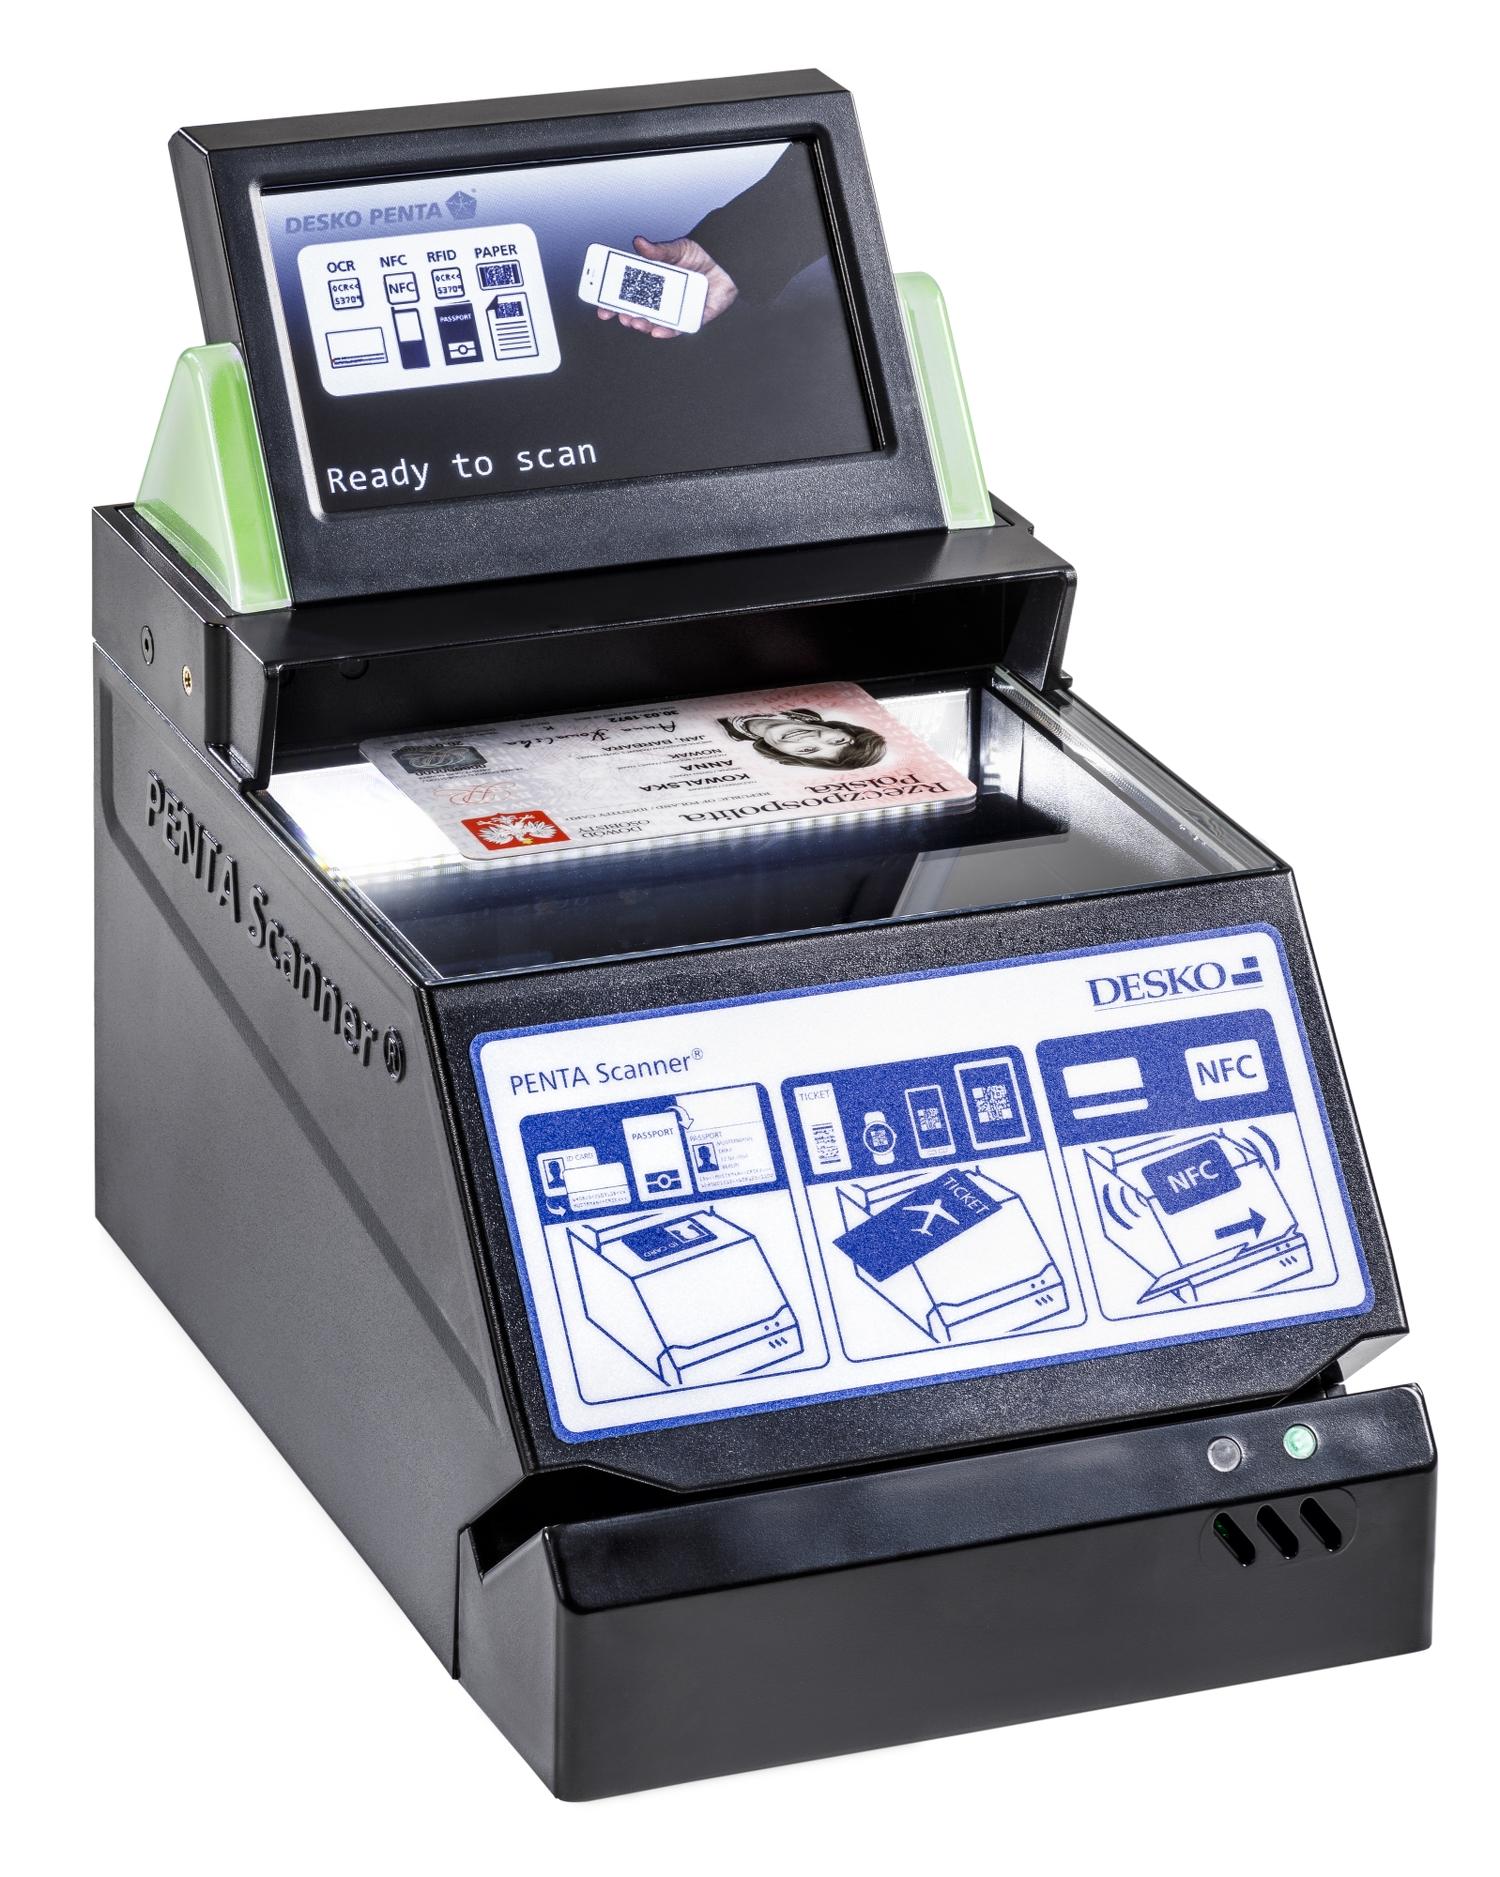 Desko PENTA Scanner ID Card - Airport Suppliers